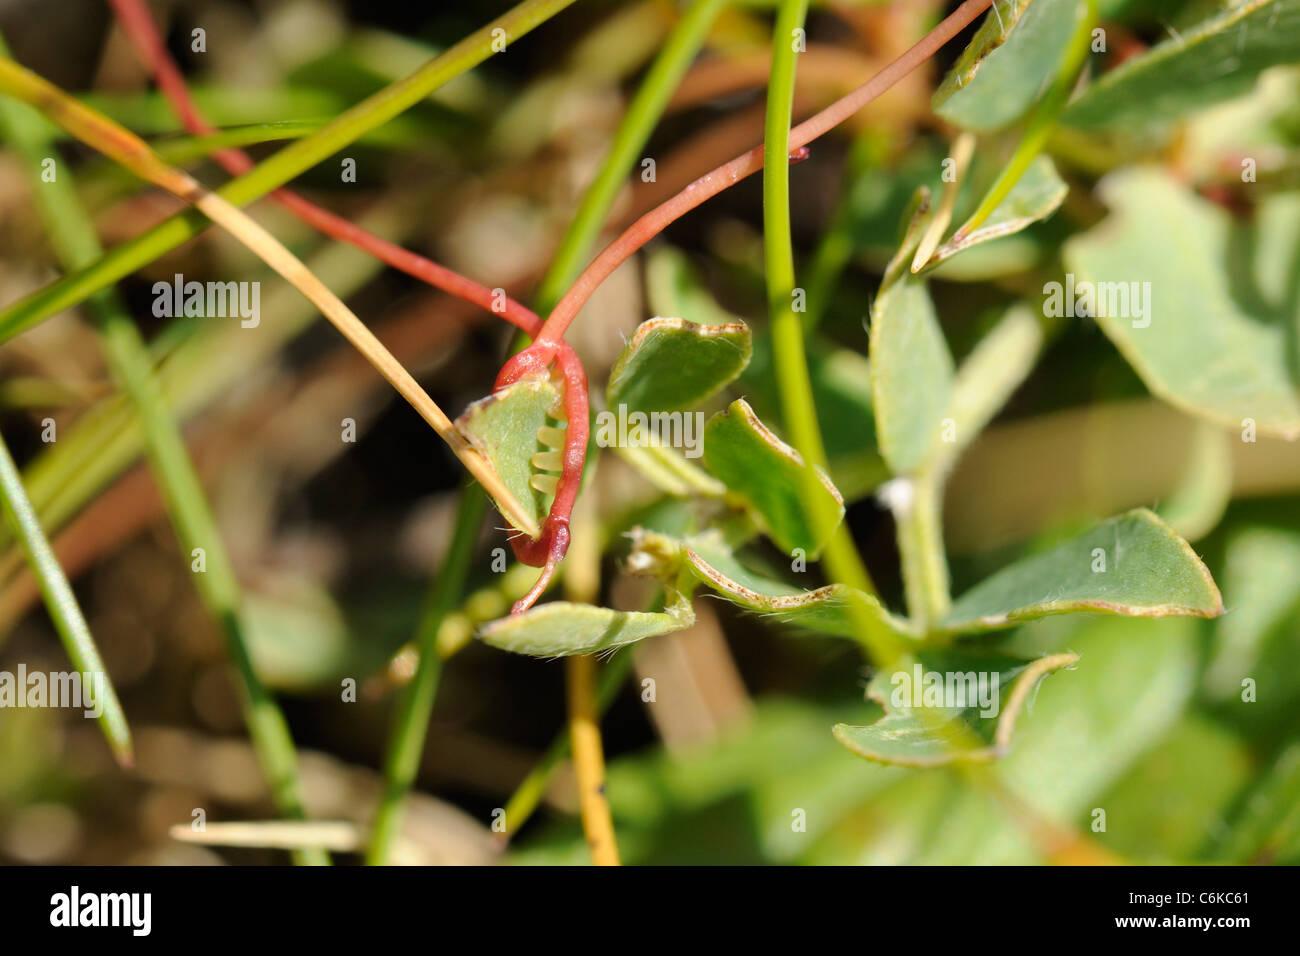 Dodder, Cuscuta epithymum - Stock Image